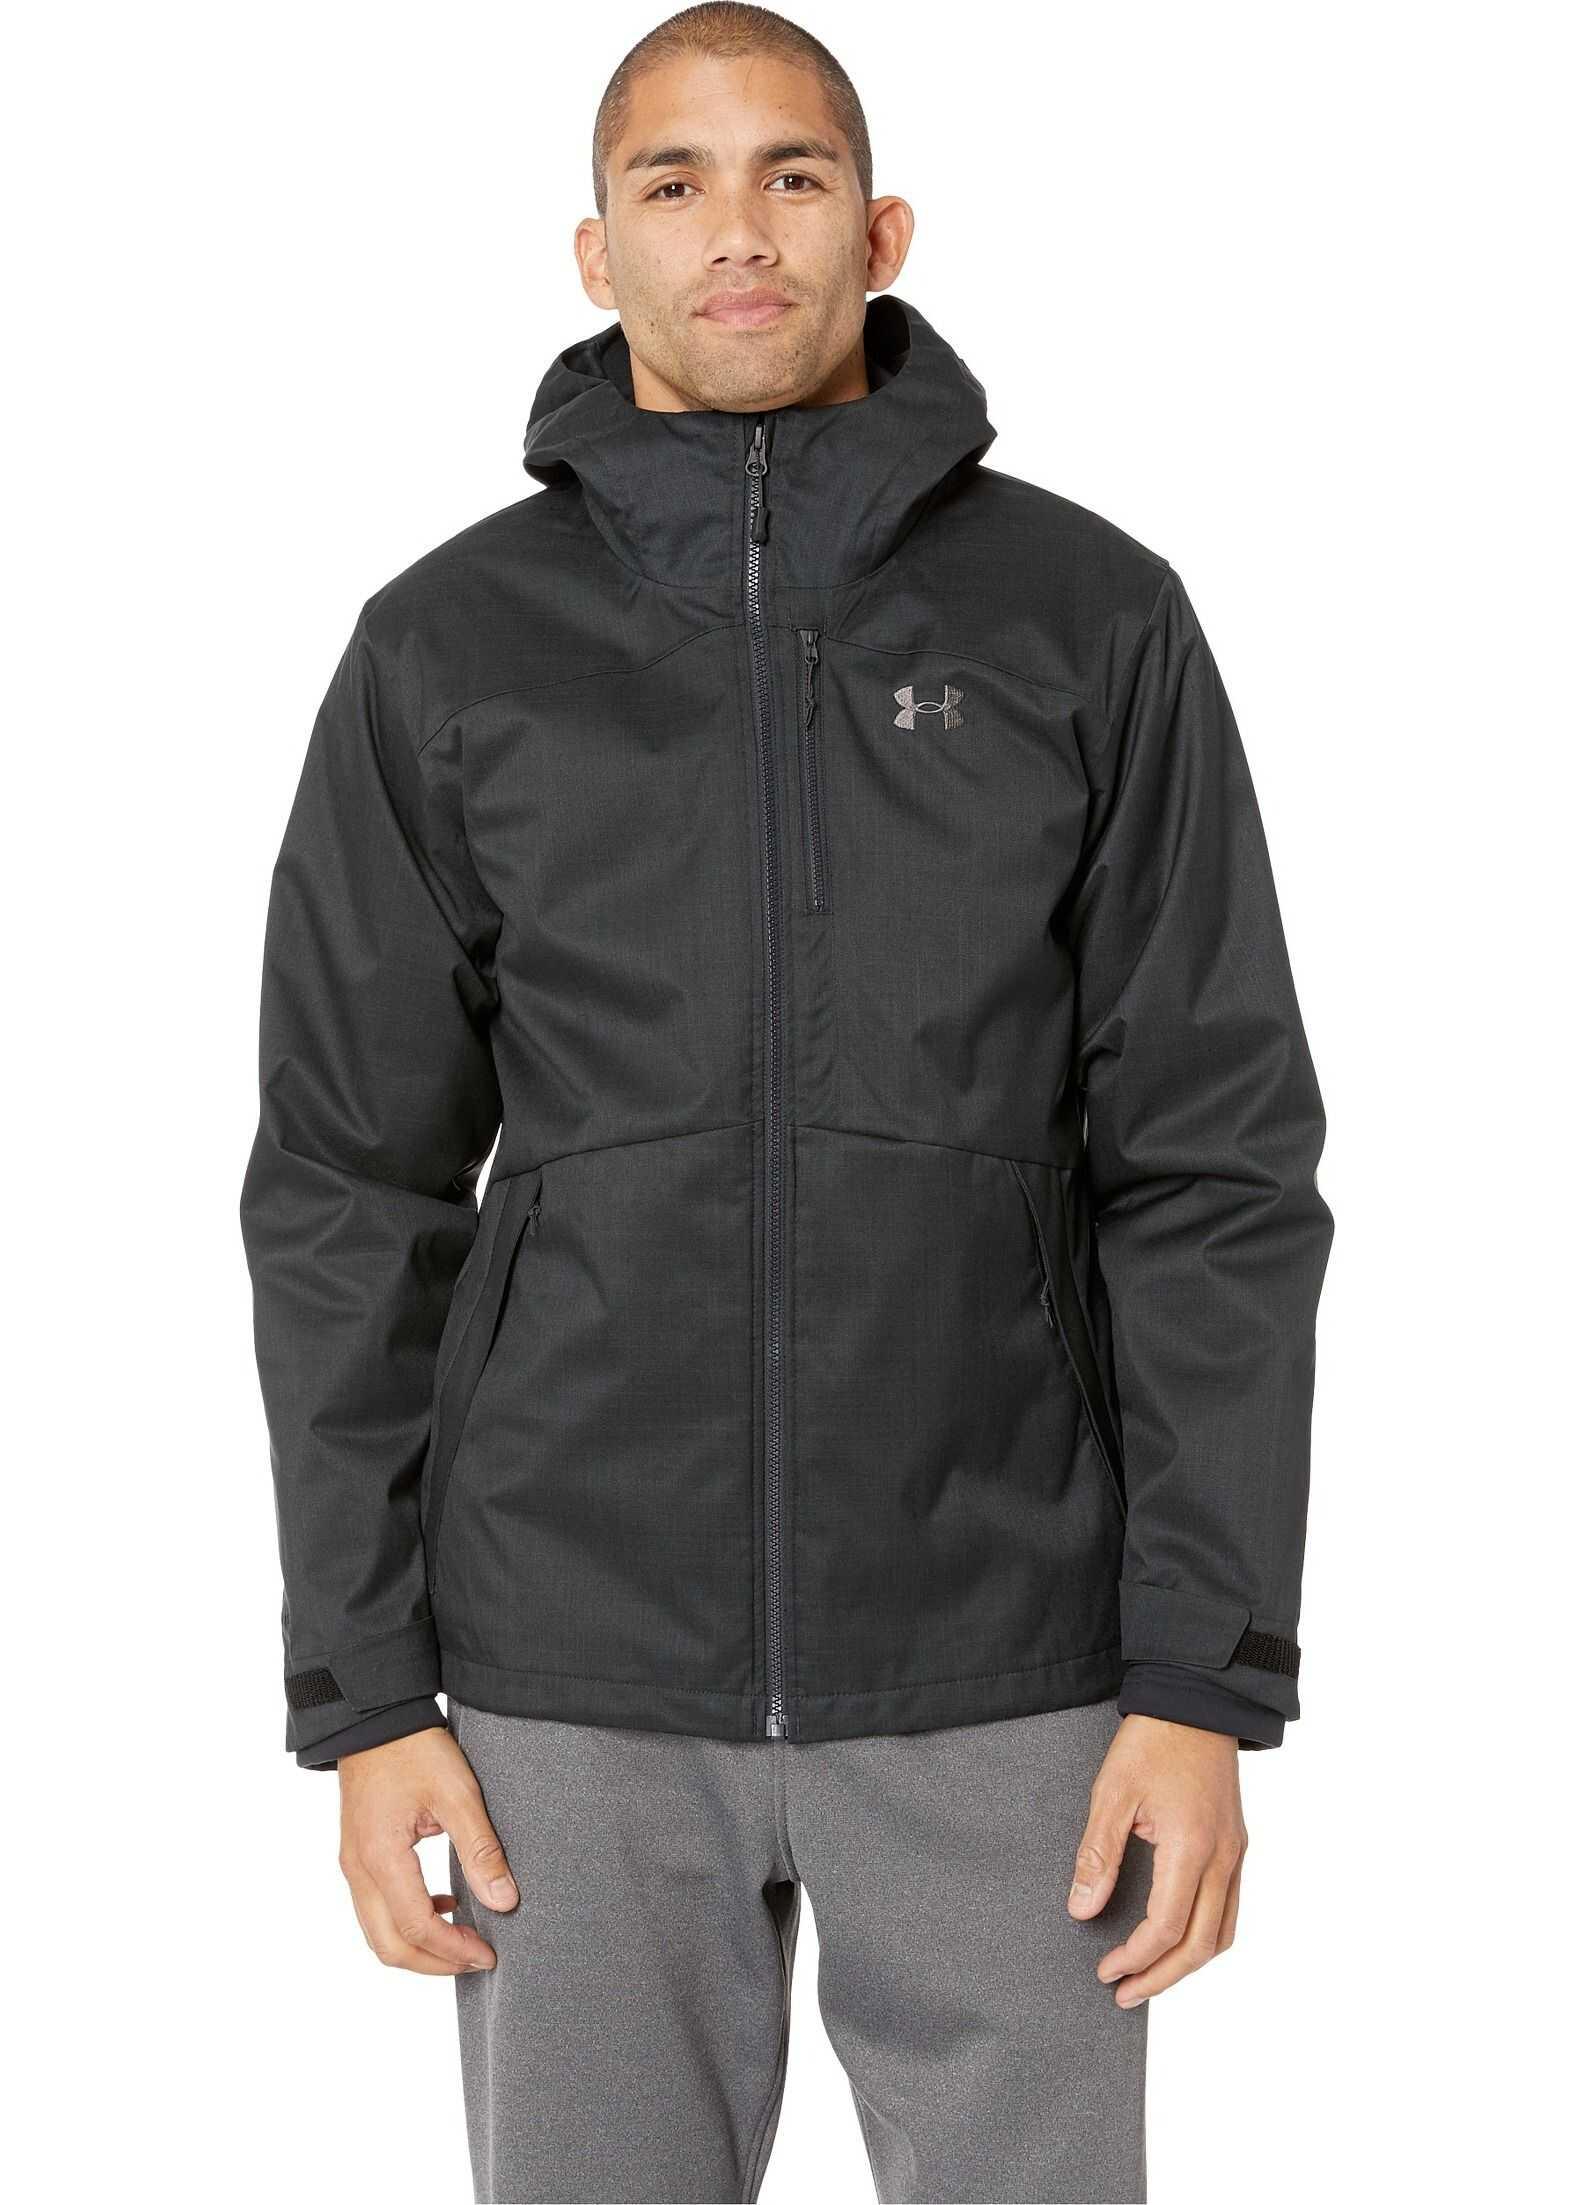 Under Armour UA Porter 3-in-1 Jacket Black/Black/Charcoal